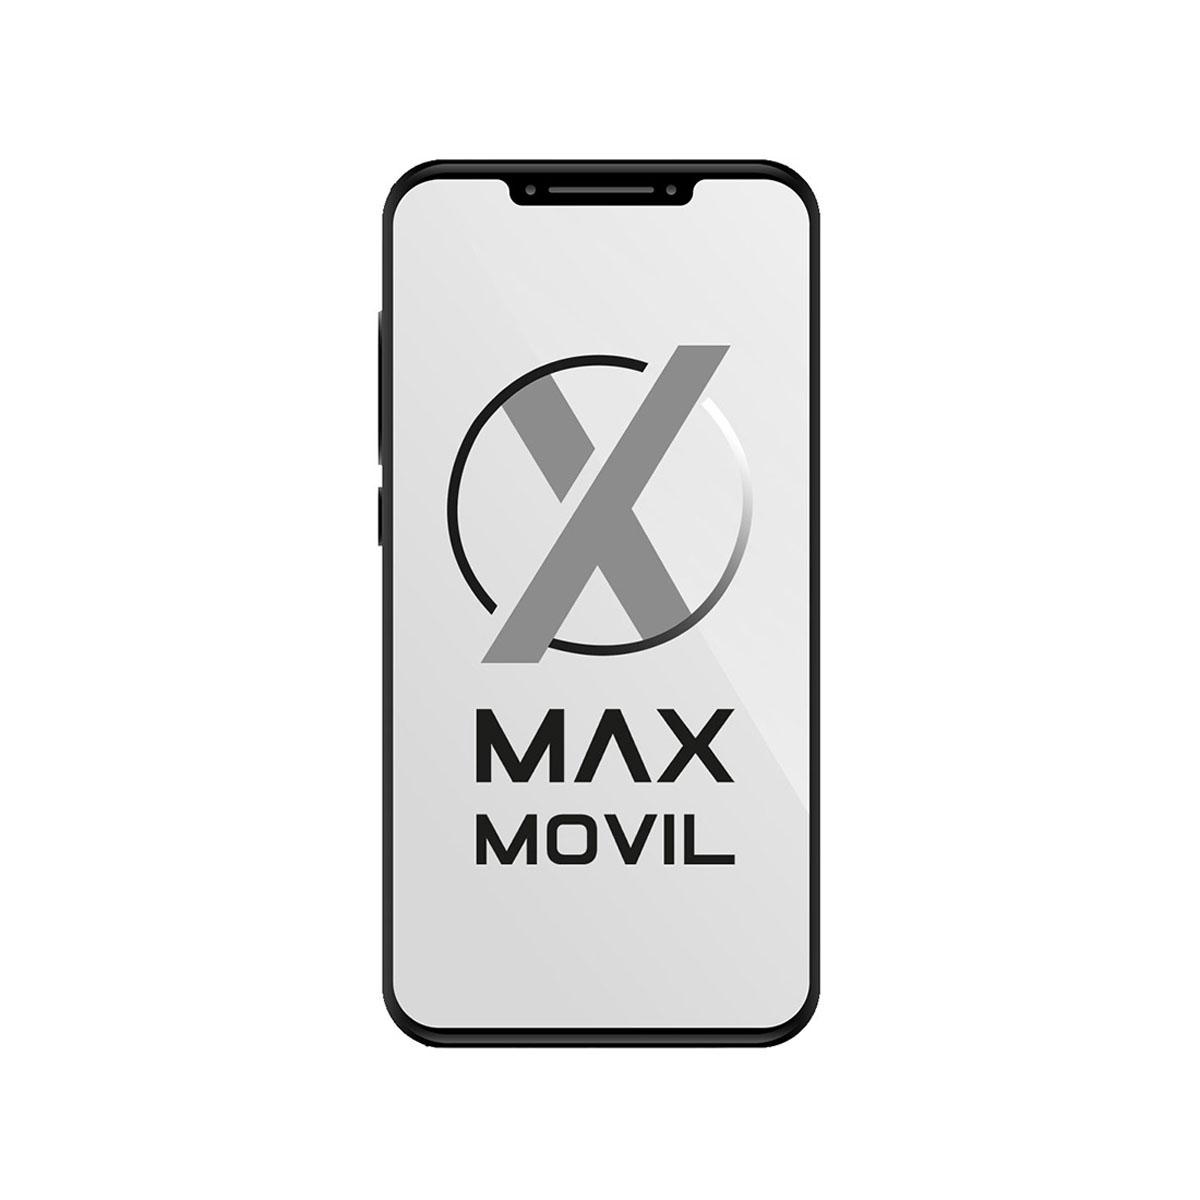 Protector de pantalla 4smarts para Huawei MediaPad M2